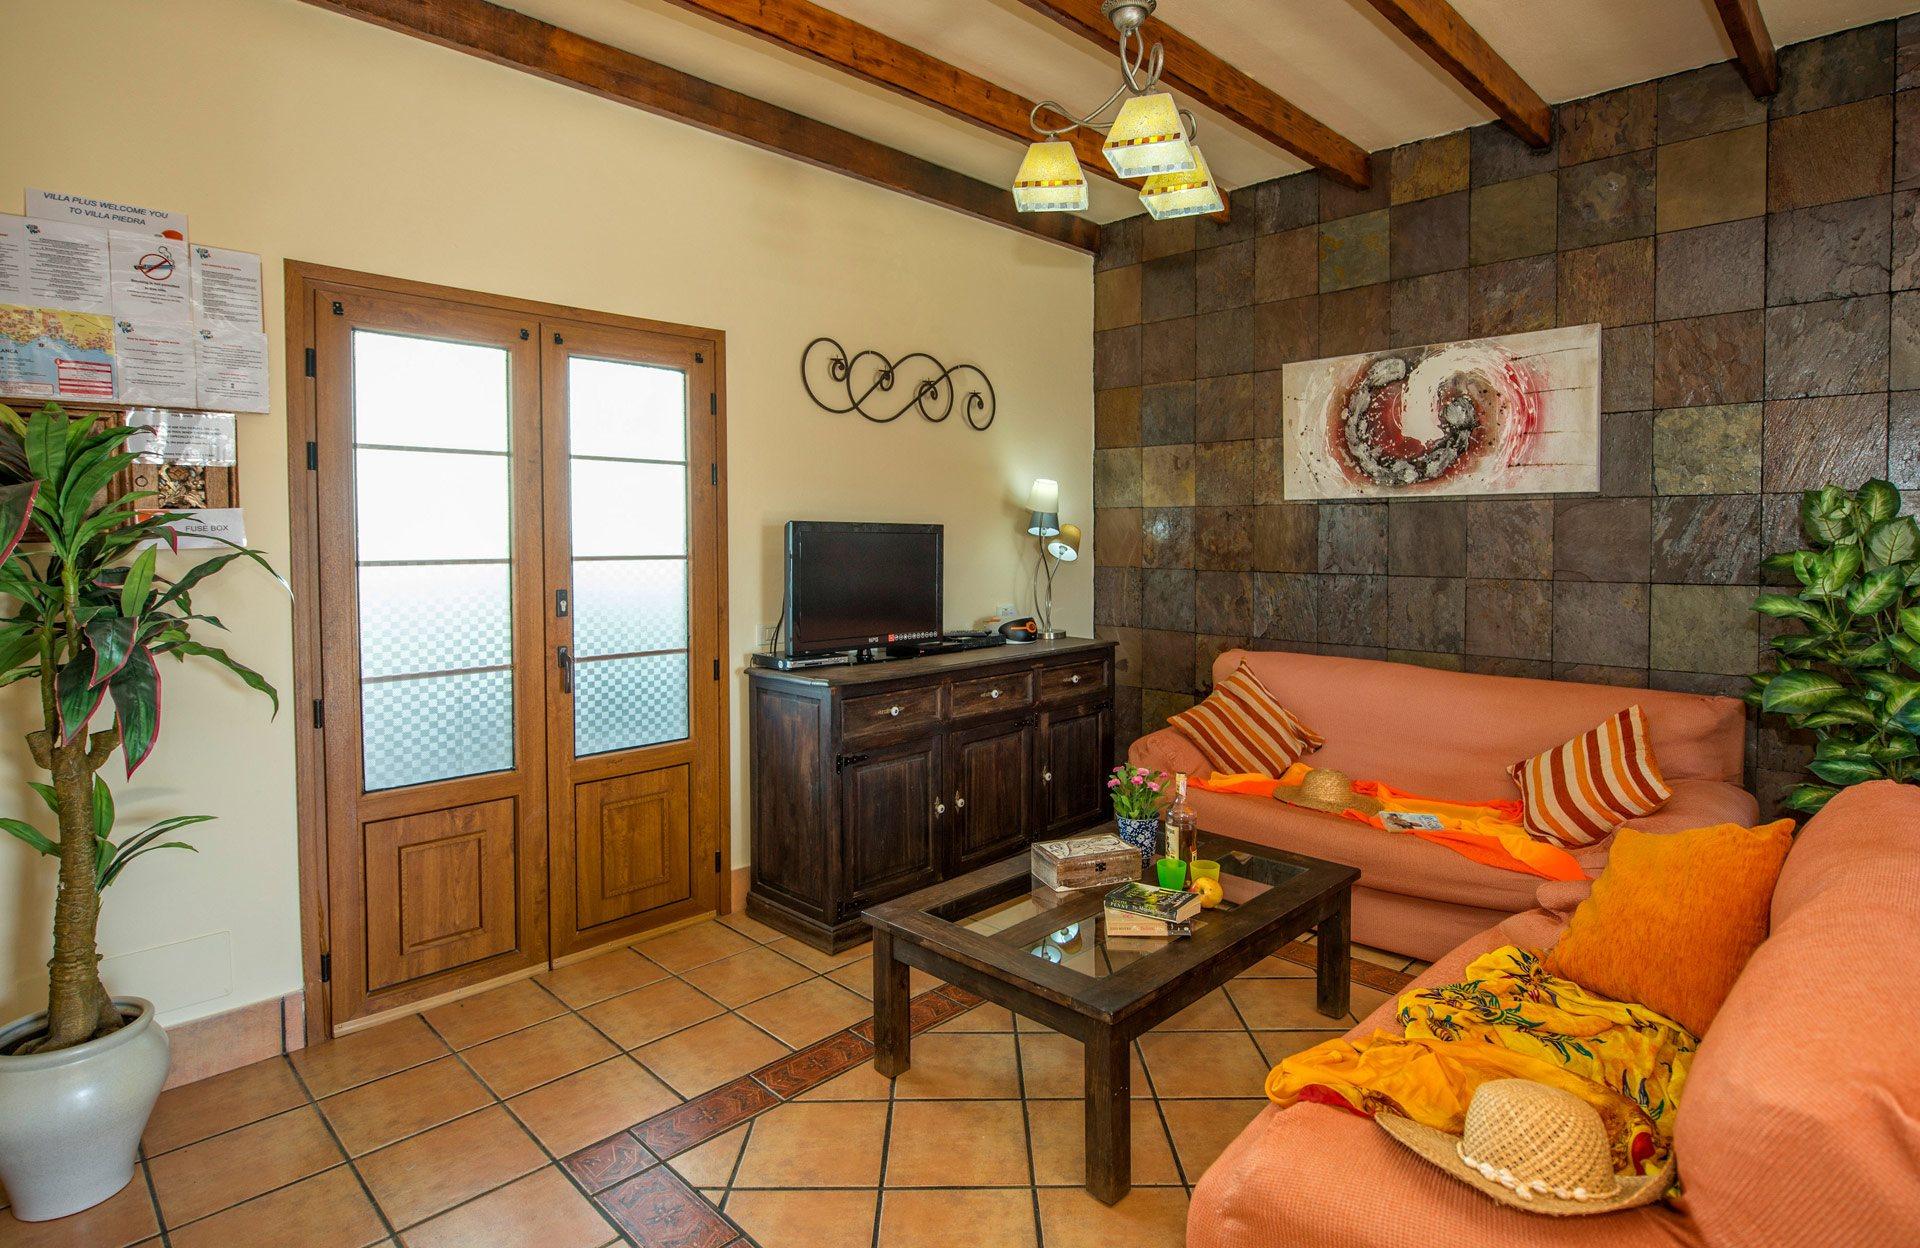 Villa Piedra In Playa Blanca Lanzarote Plus Swimming Pool Fuse Box